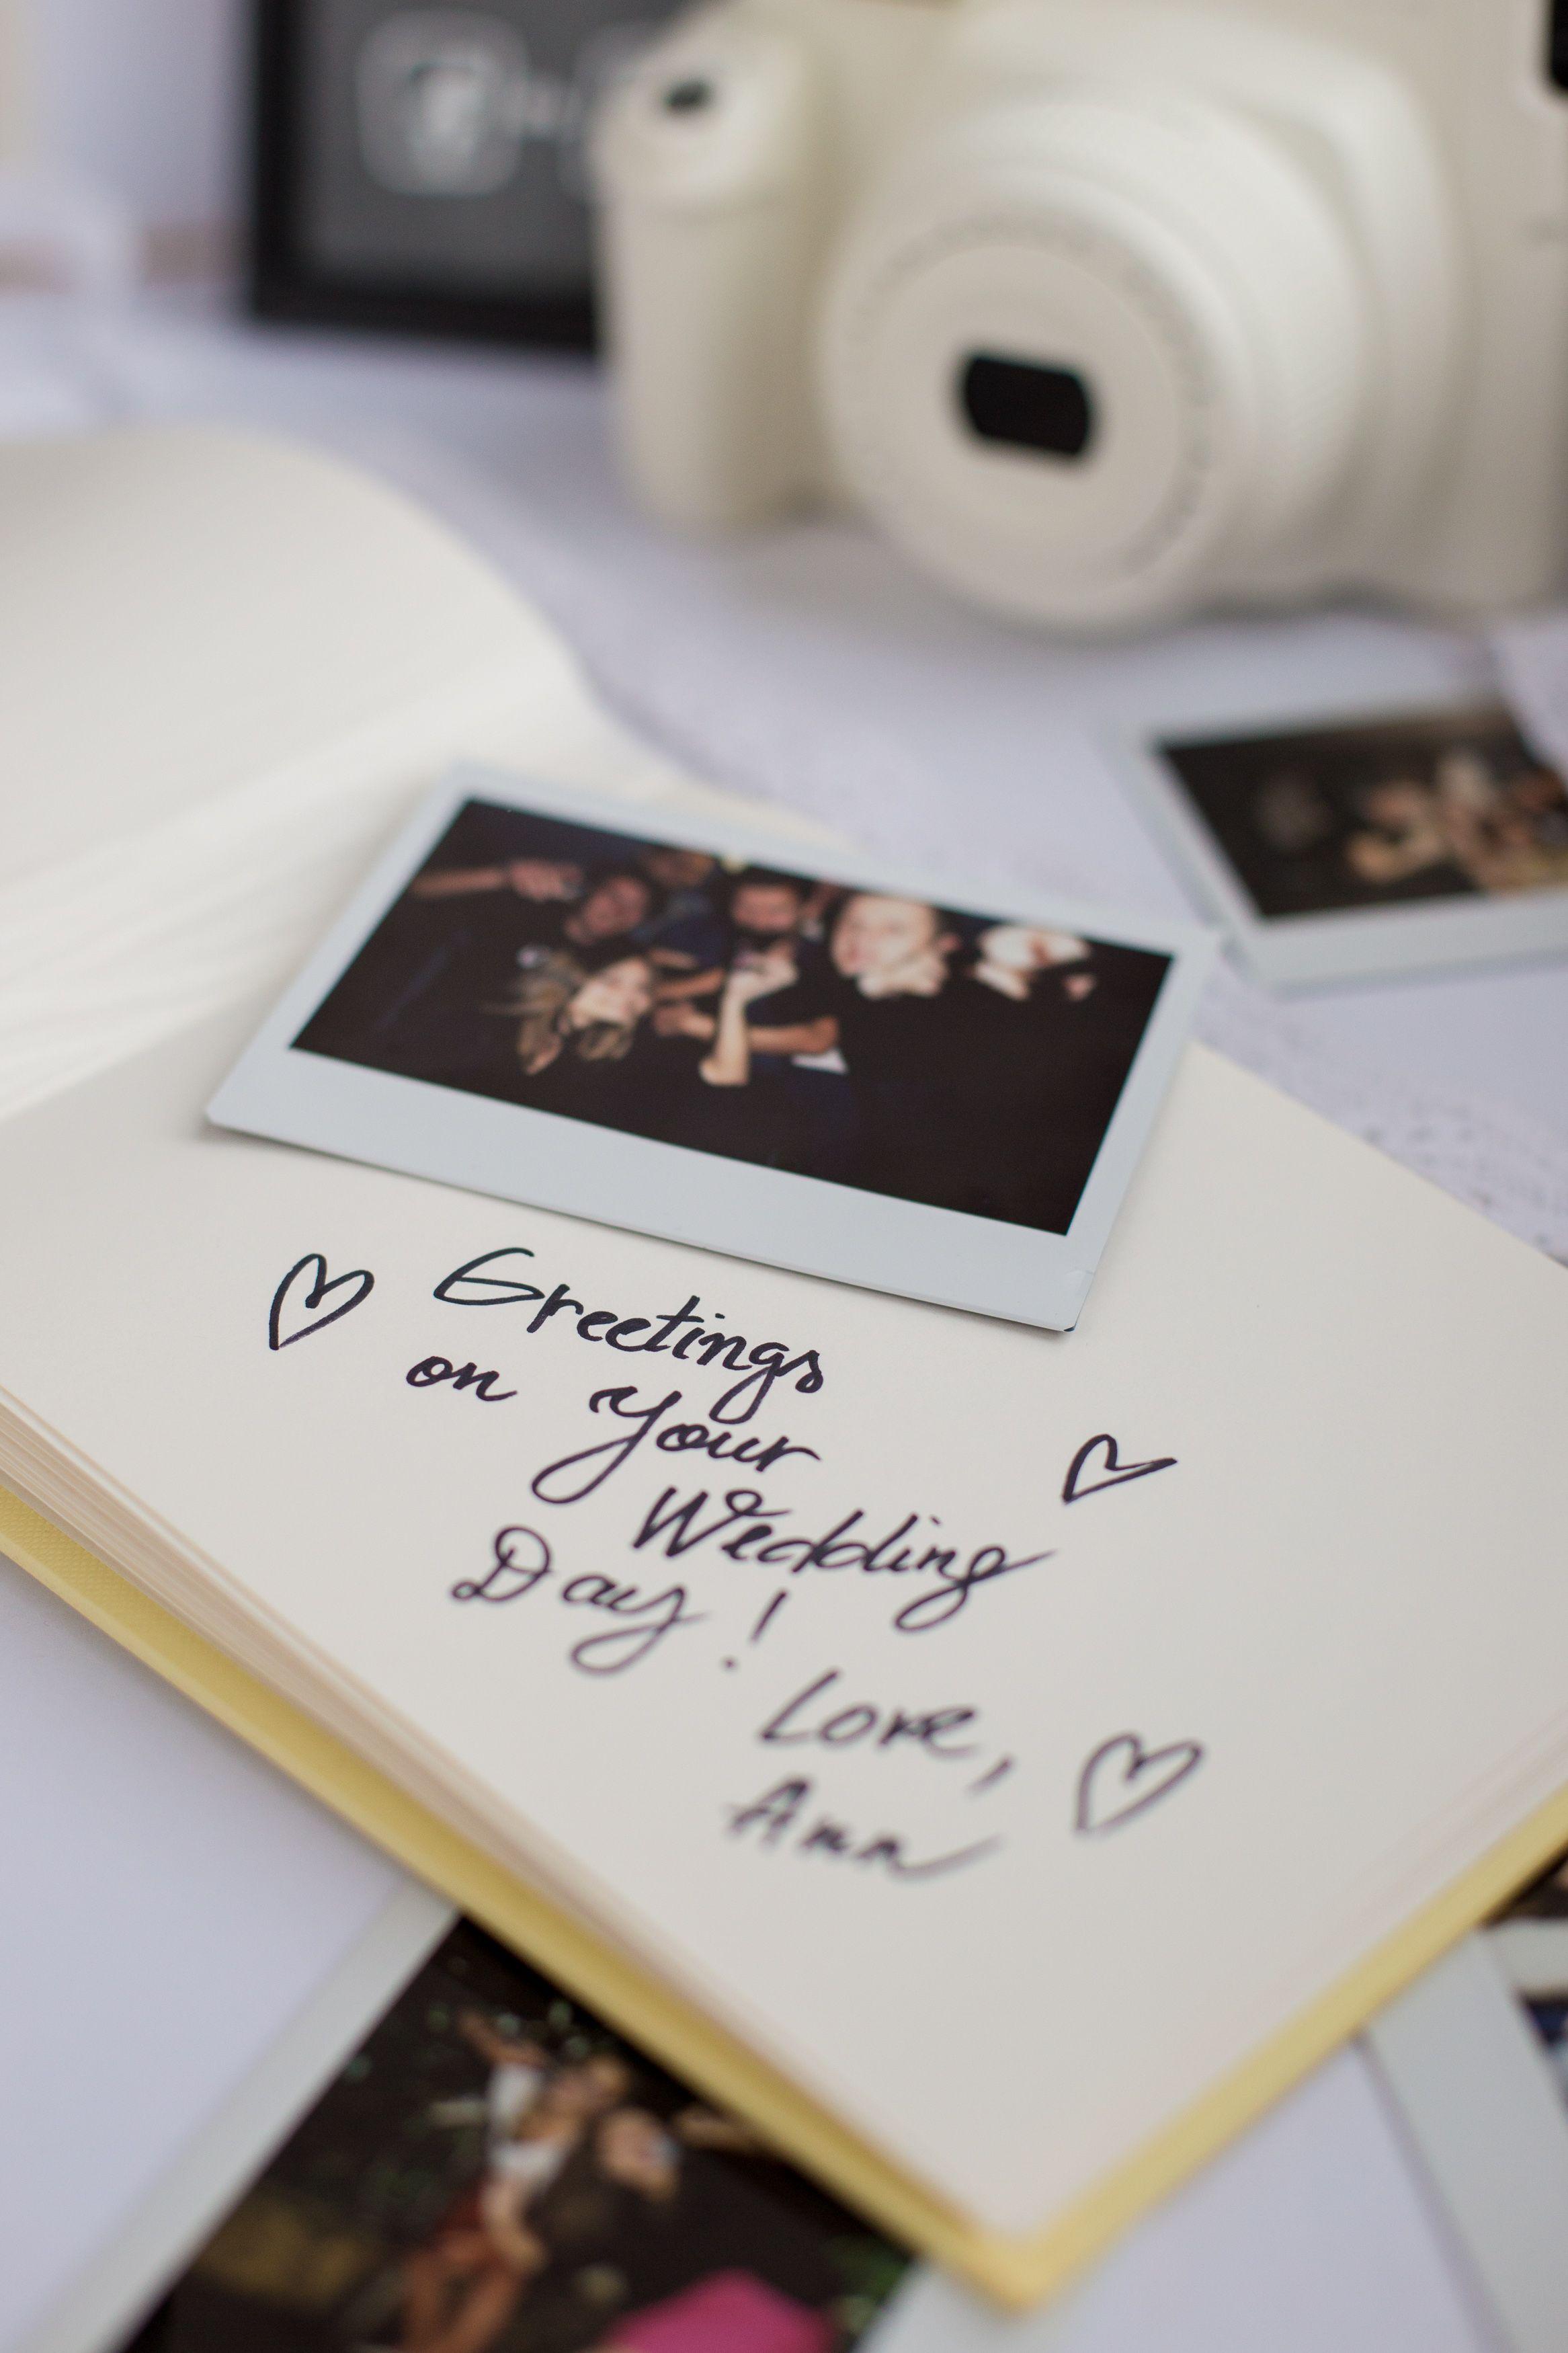 Polaroid Wedding Guests Will Love Polaroid Guest Book Polaroid Wedding Instax Instax Mini Album Polaroid Guest Book Polaroid Wedding